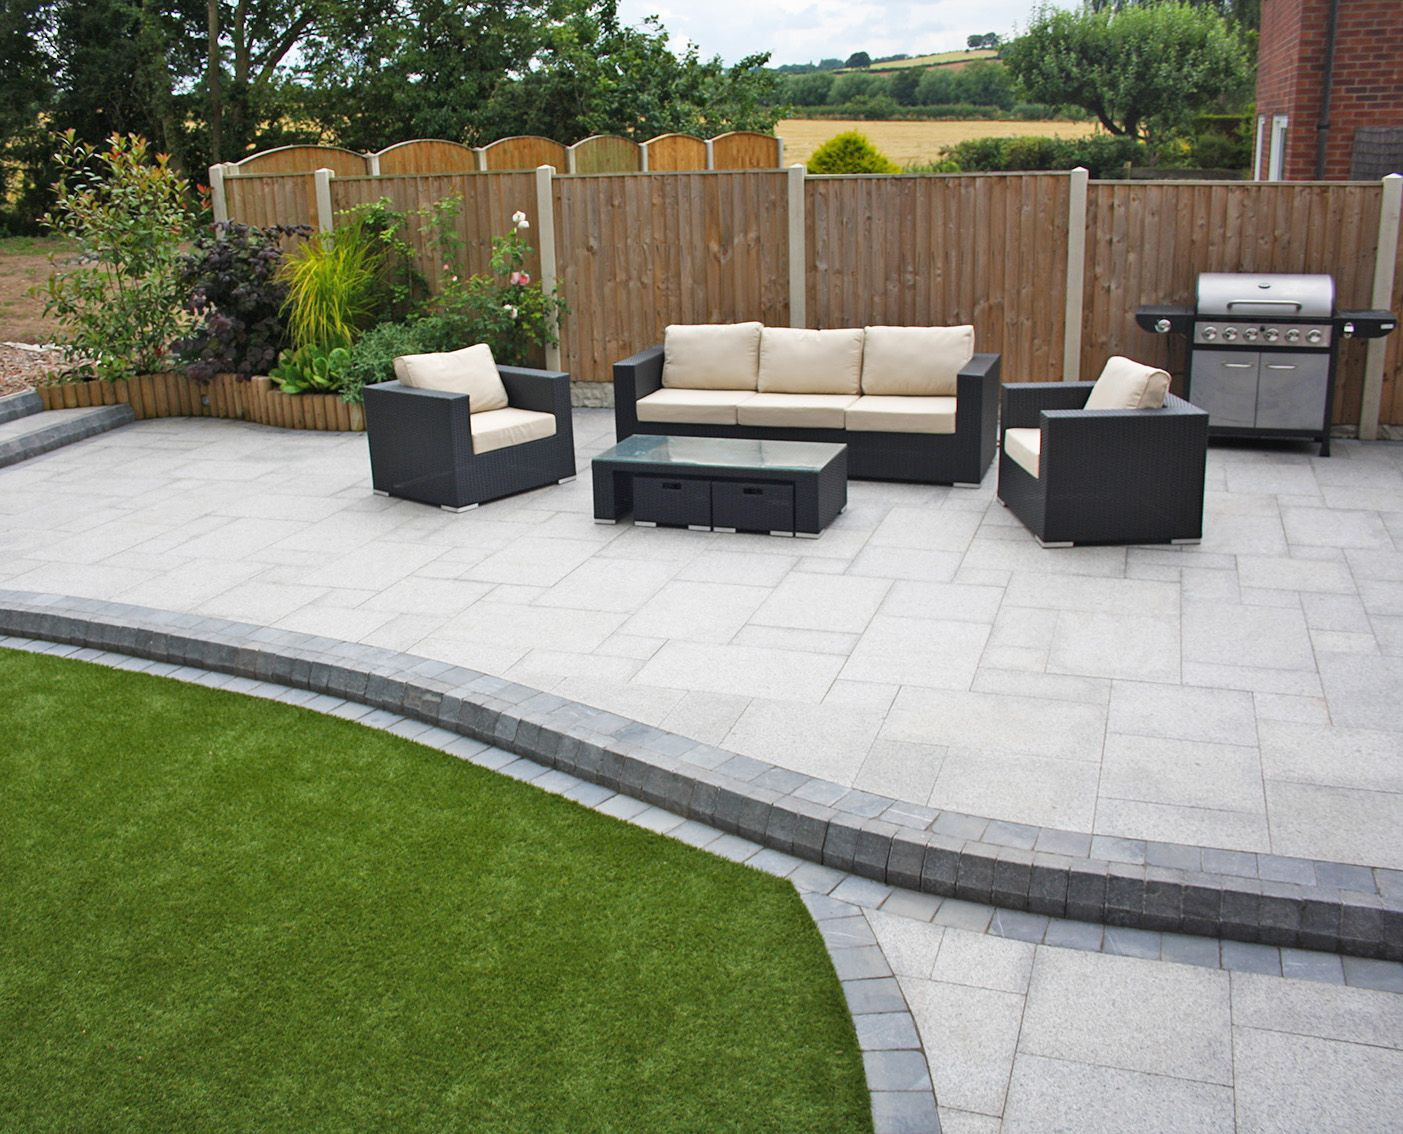 8 excellent modern garden patio ideas TVZELJR